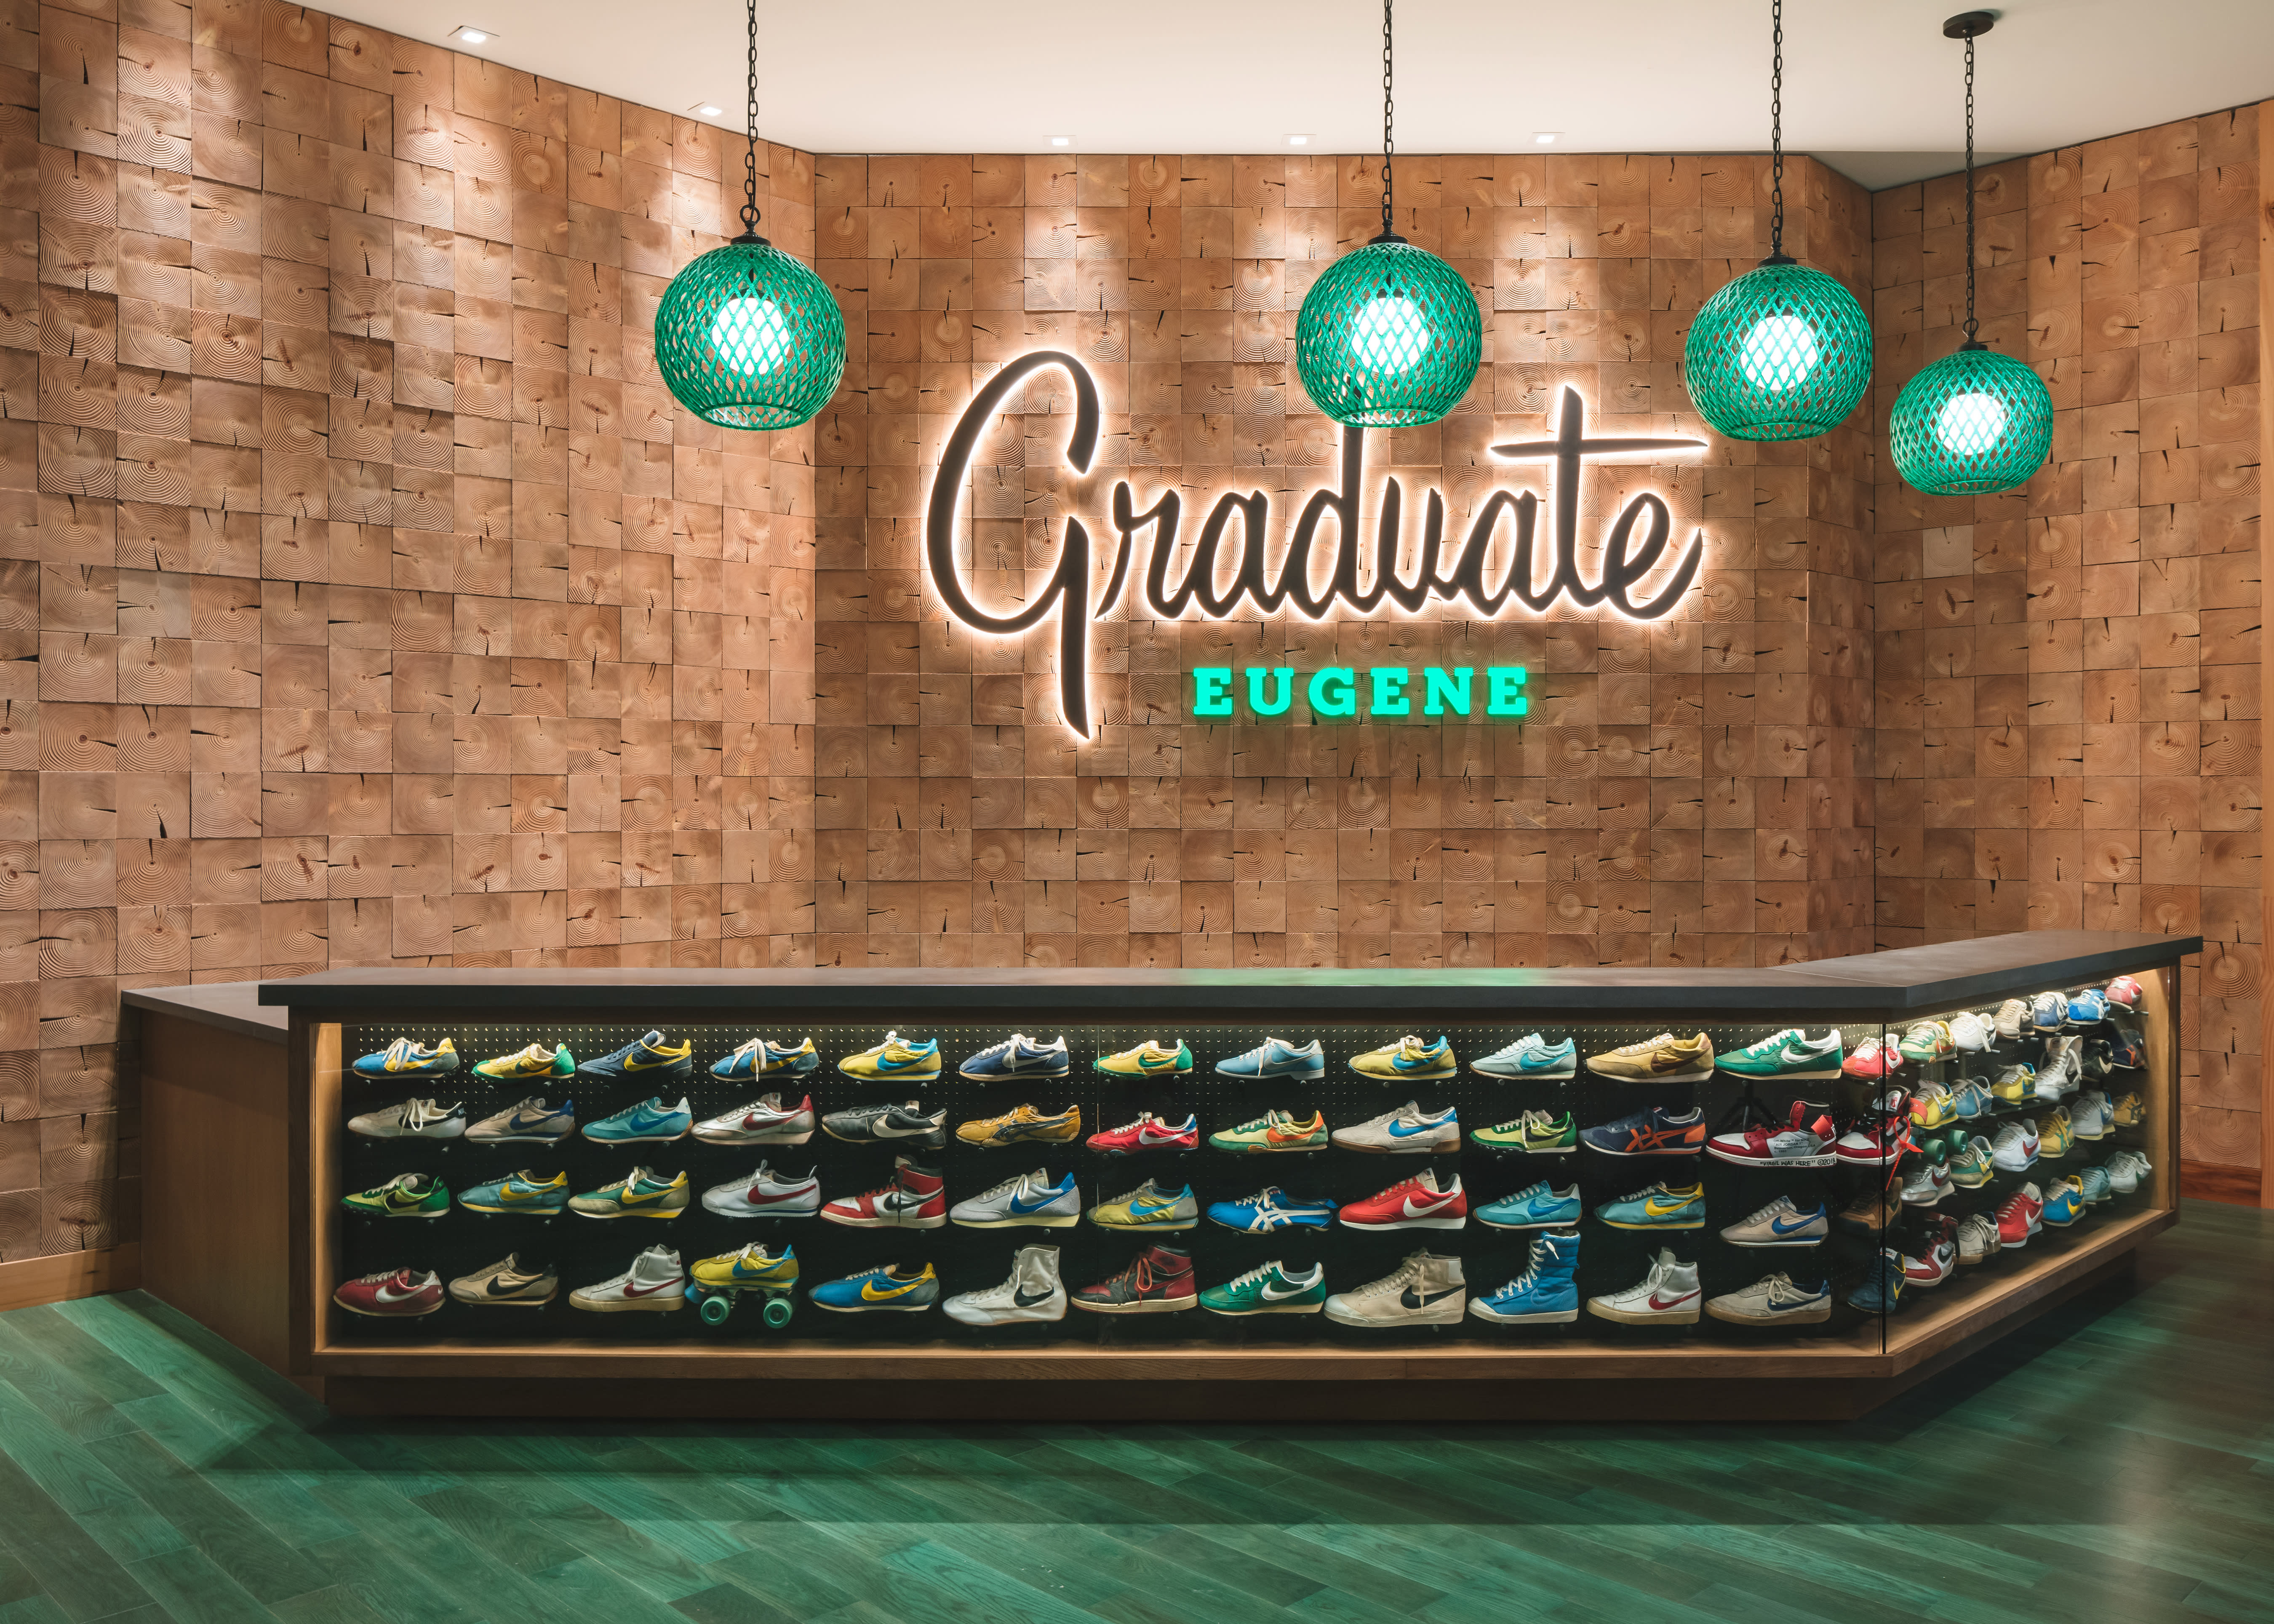 Graduate Hotel Eugene, Oregon Vintage Nike Display 1